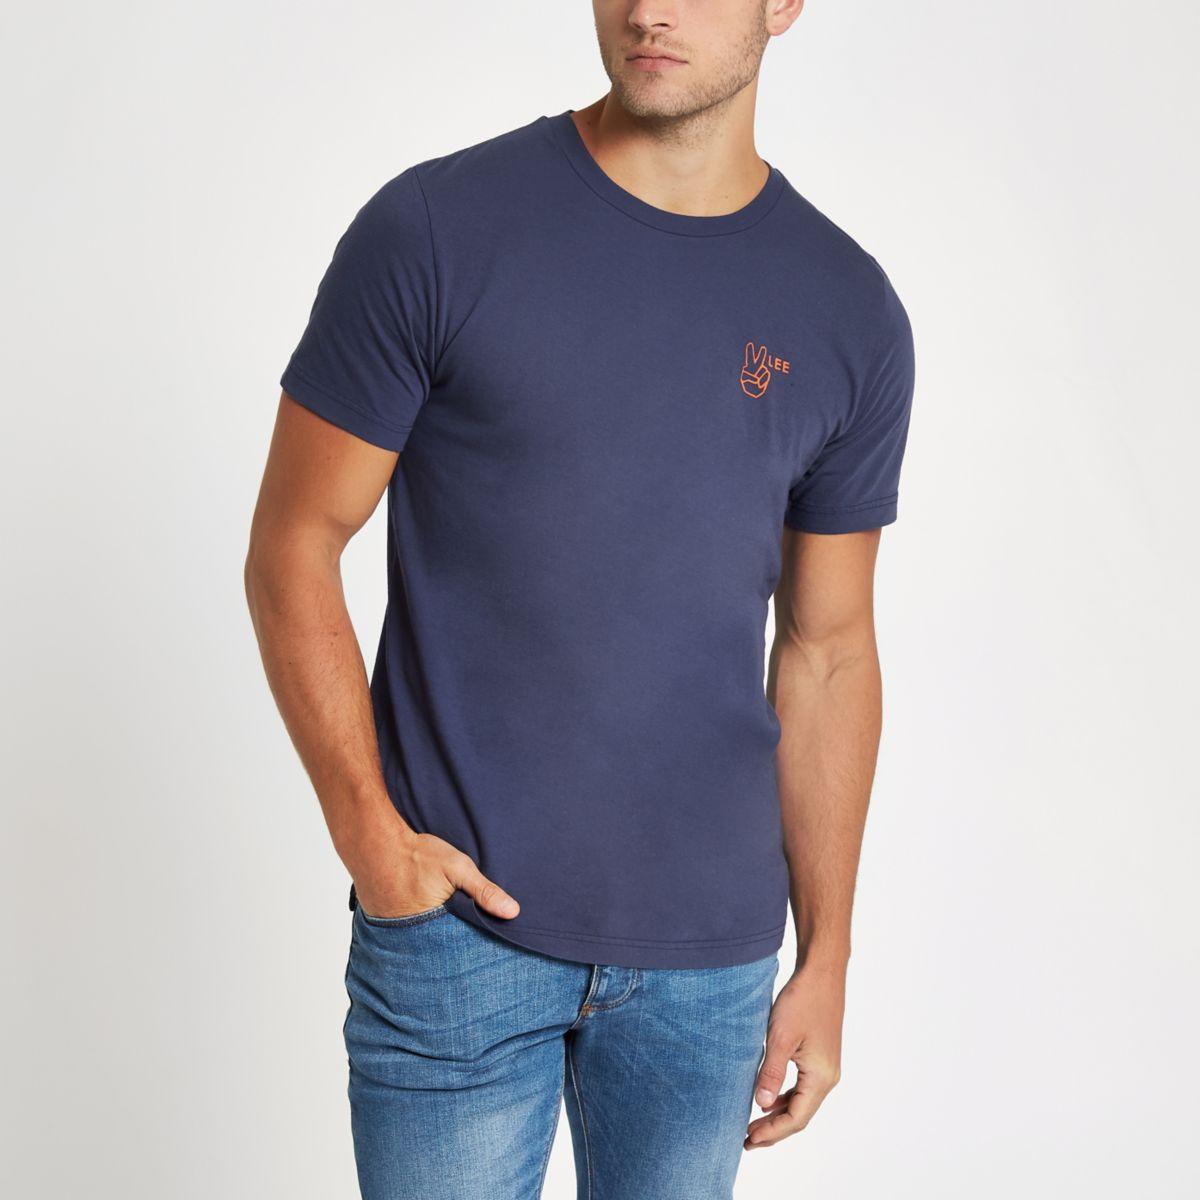 Lee blue logo T-shirt